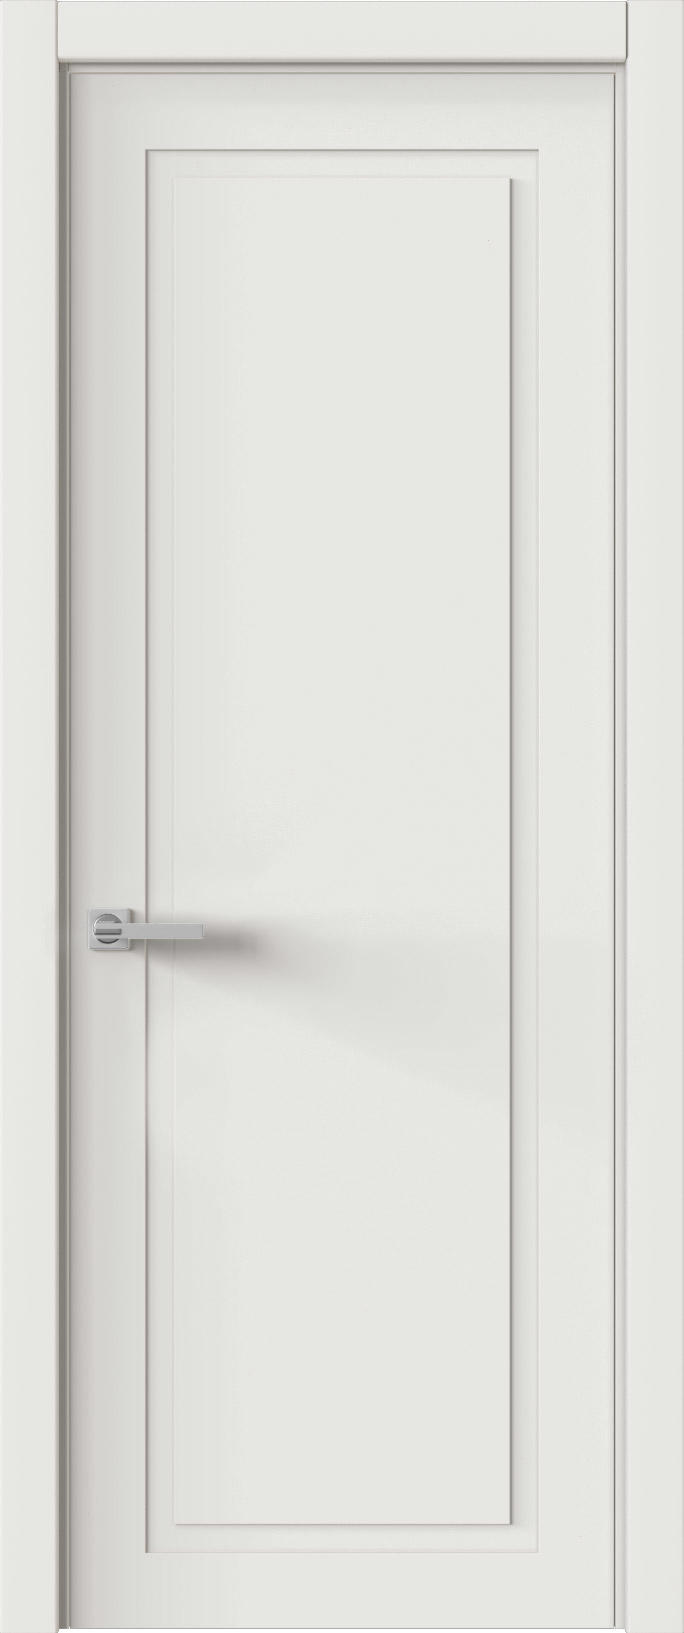 Tivoli Д-5 цвет - Белая эмаль (RAL 9003) Без стекла (ДГ)